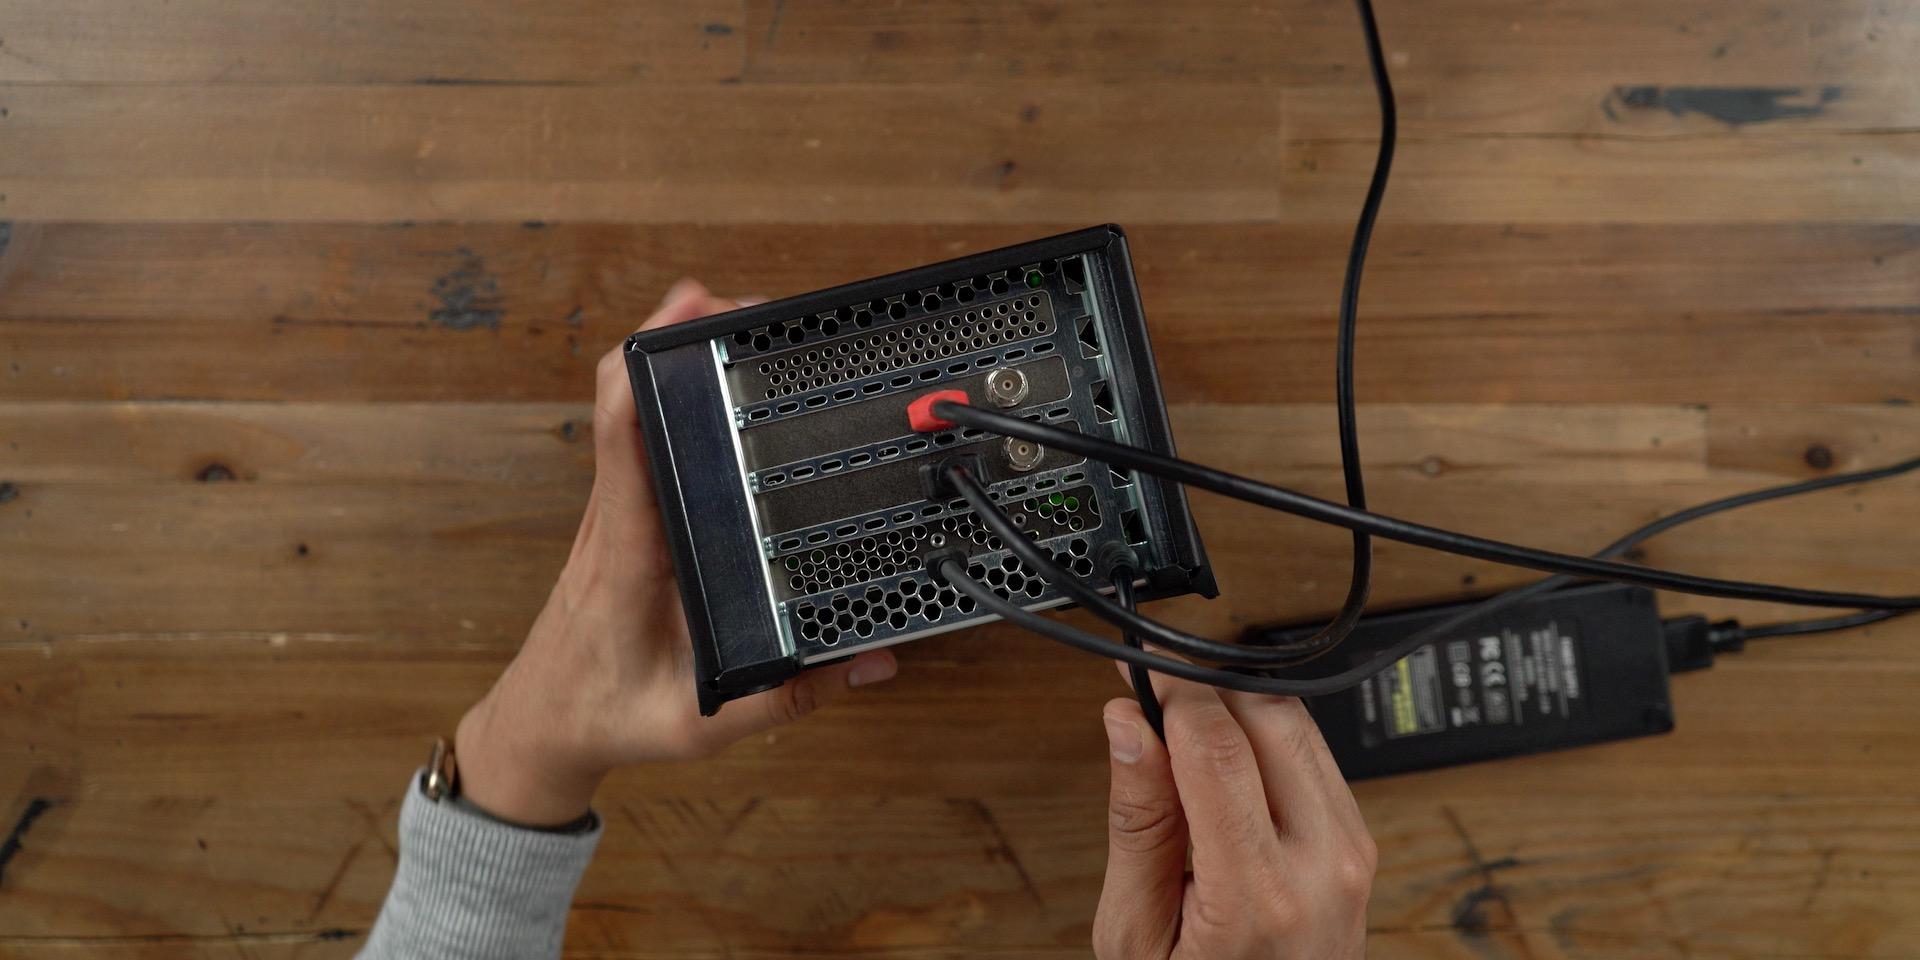 Blackmagic DeckLink Mini Recorder 4K HDMI Thunderbolt 3 connected inside Sonnet Echo Express SEIII 4K video capture enclosure